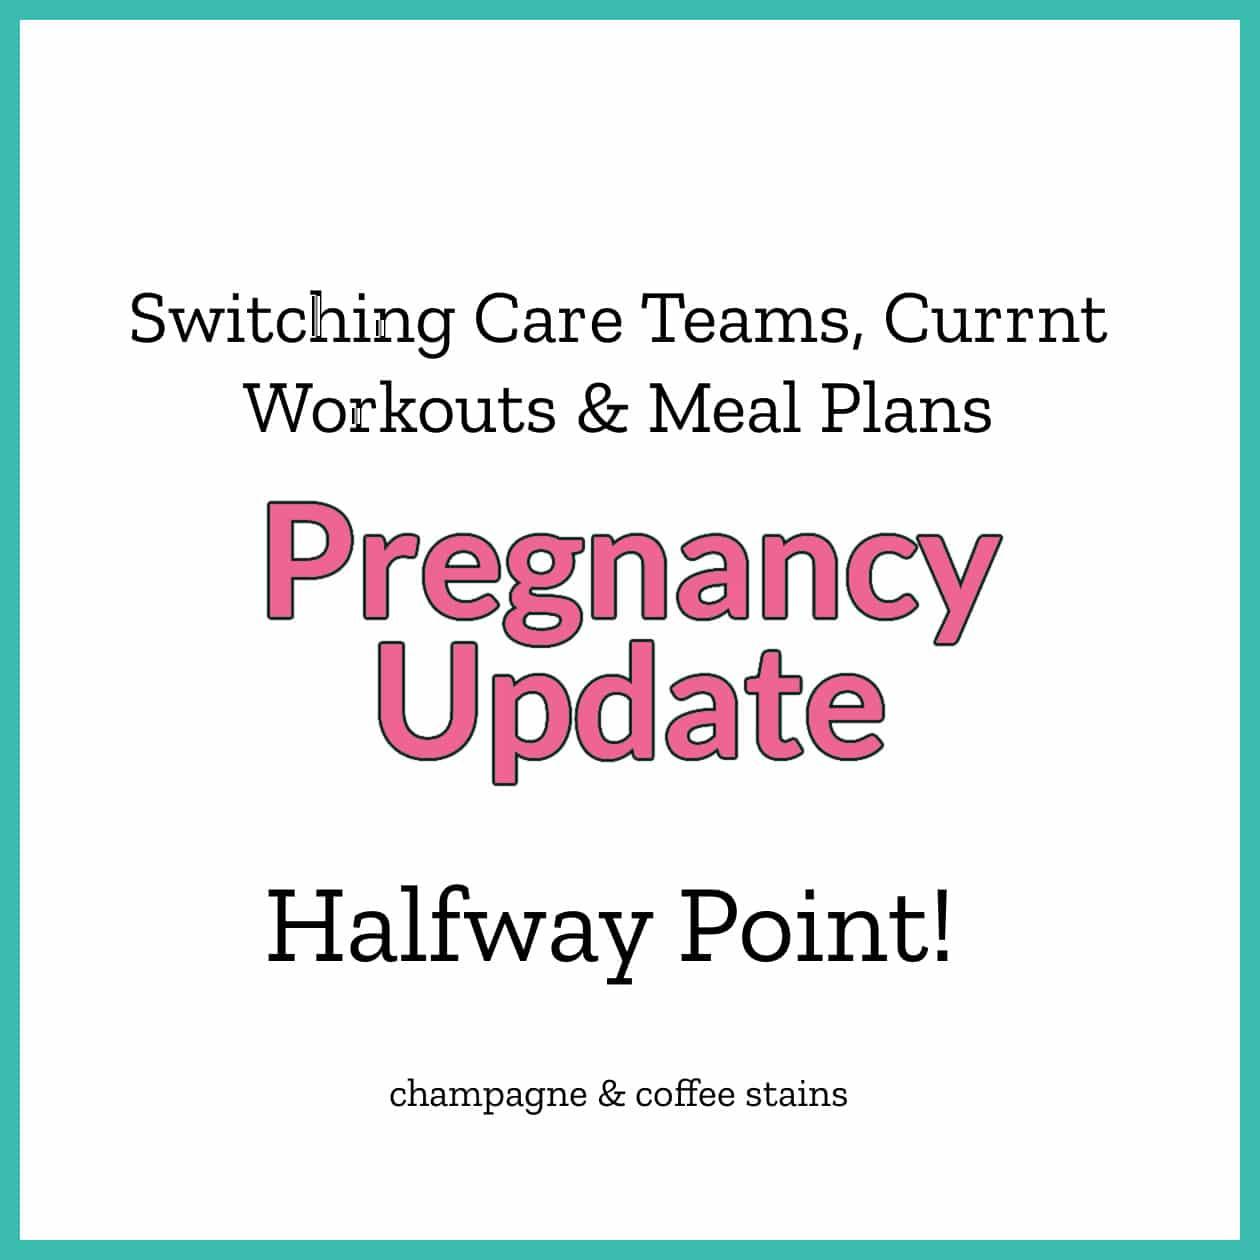 pregnancy update blog post image